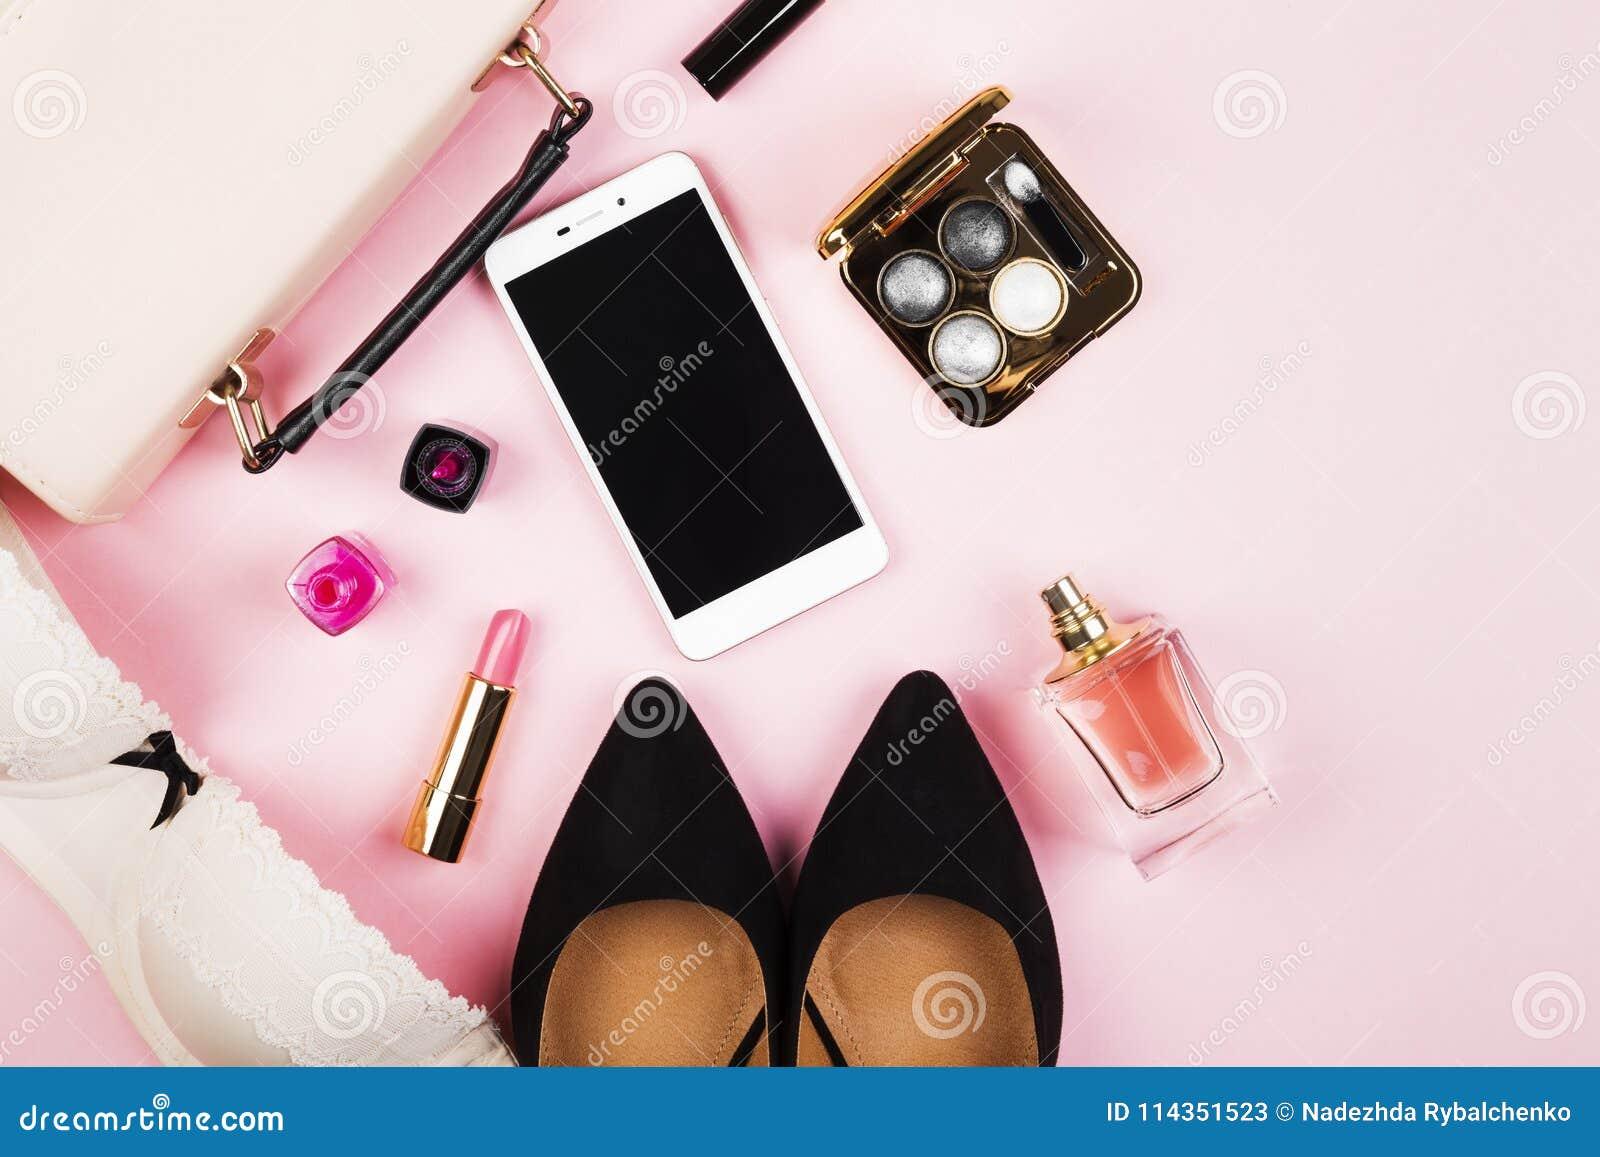 Womens Accessories Shoes Bag Cosmetics Perfume Phone On P Parfum Kopi Parfume Mobil Download